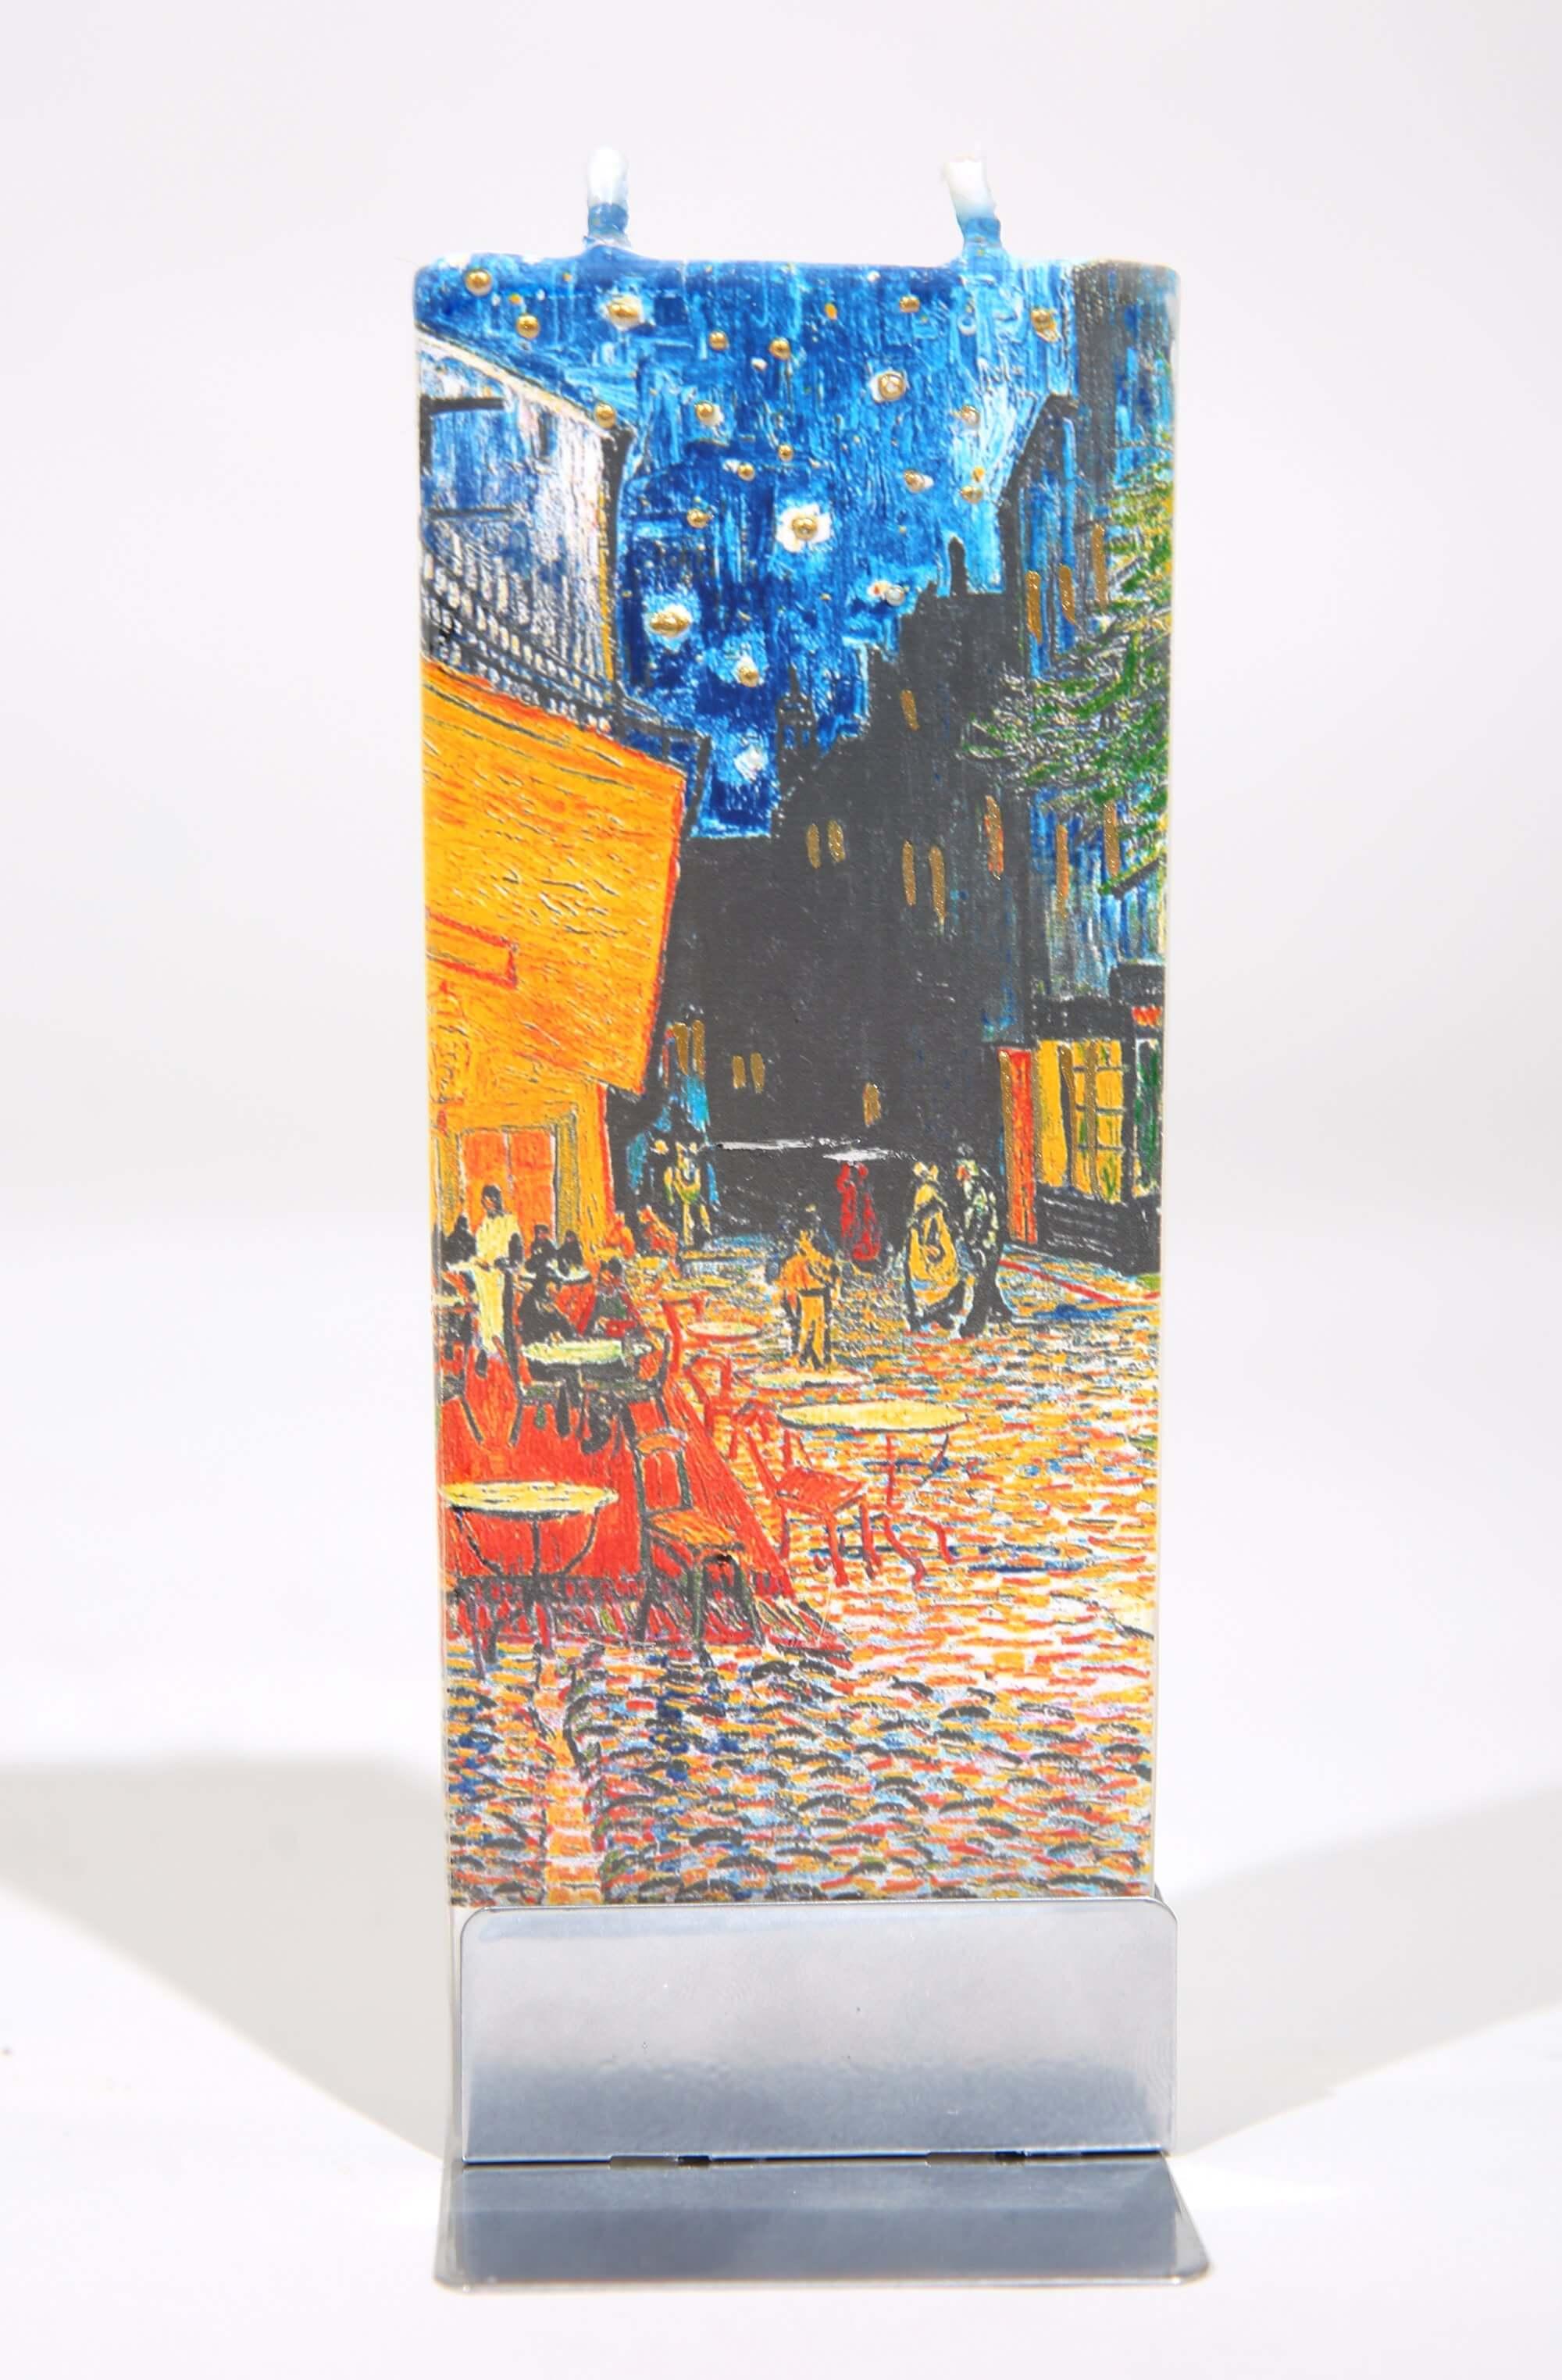 Image of Art candle